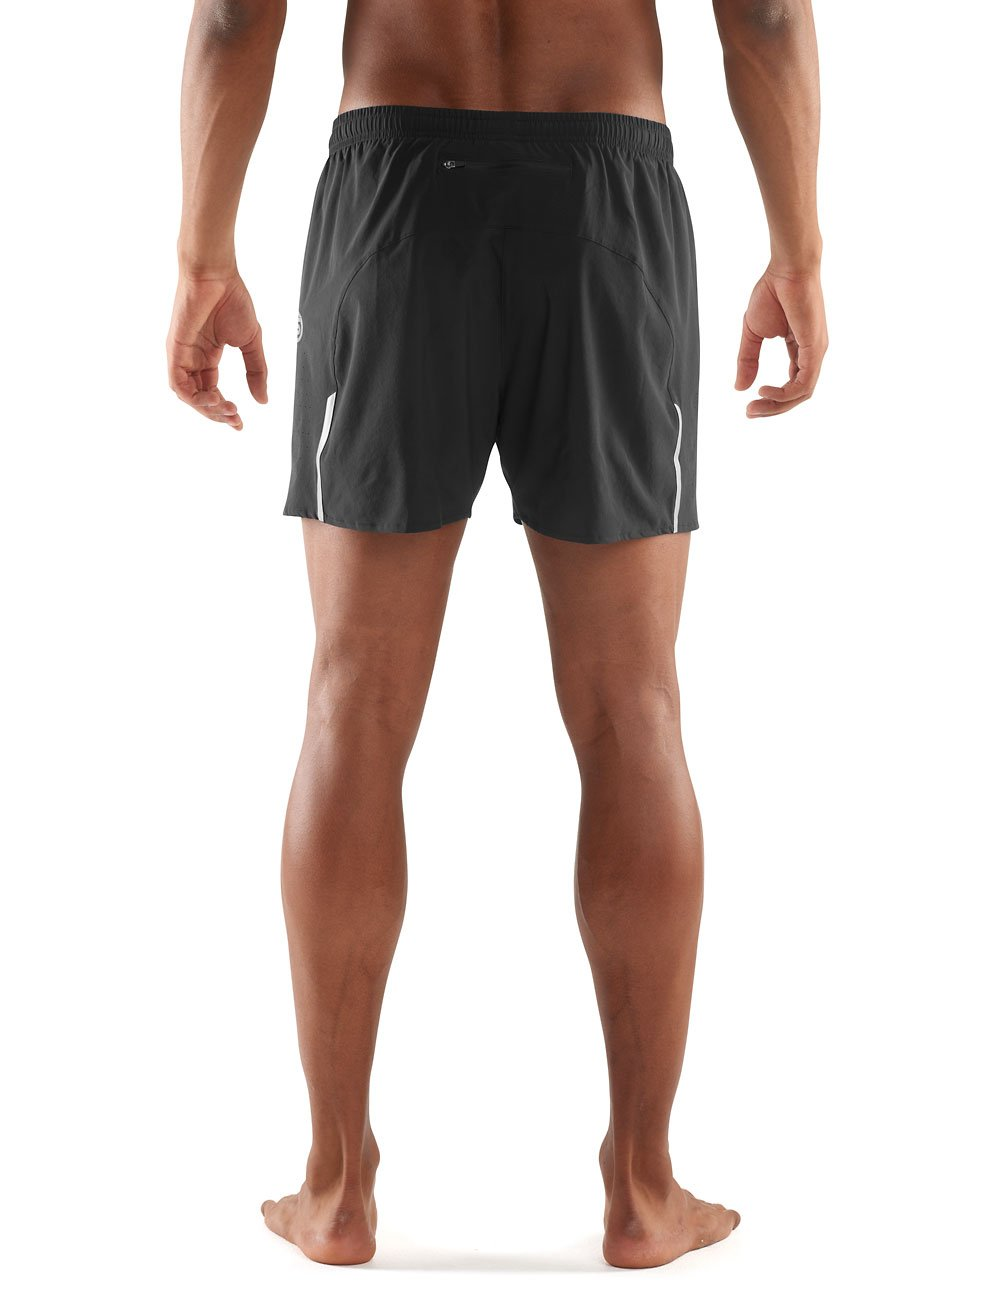 Skins Mens Network 4 Shorts Skins North America SP0032154-P